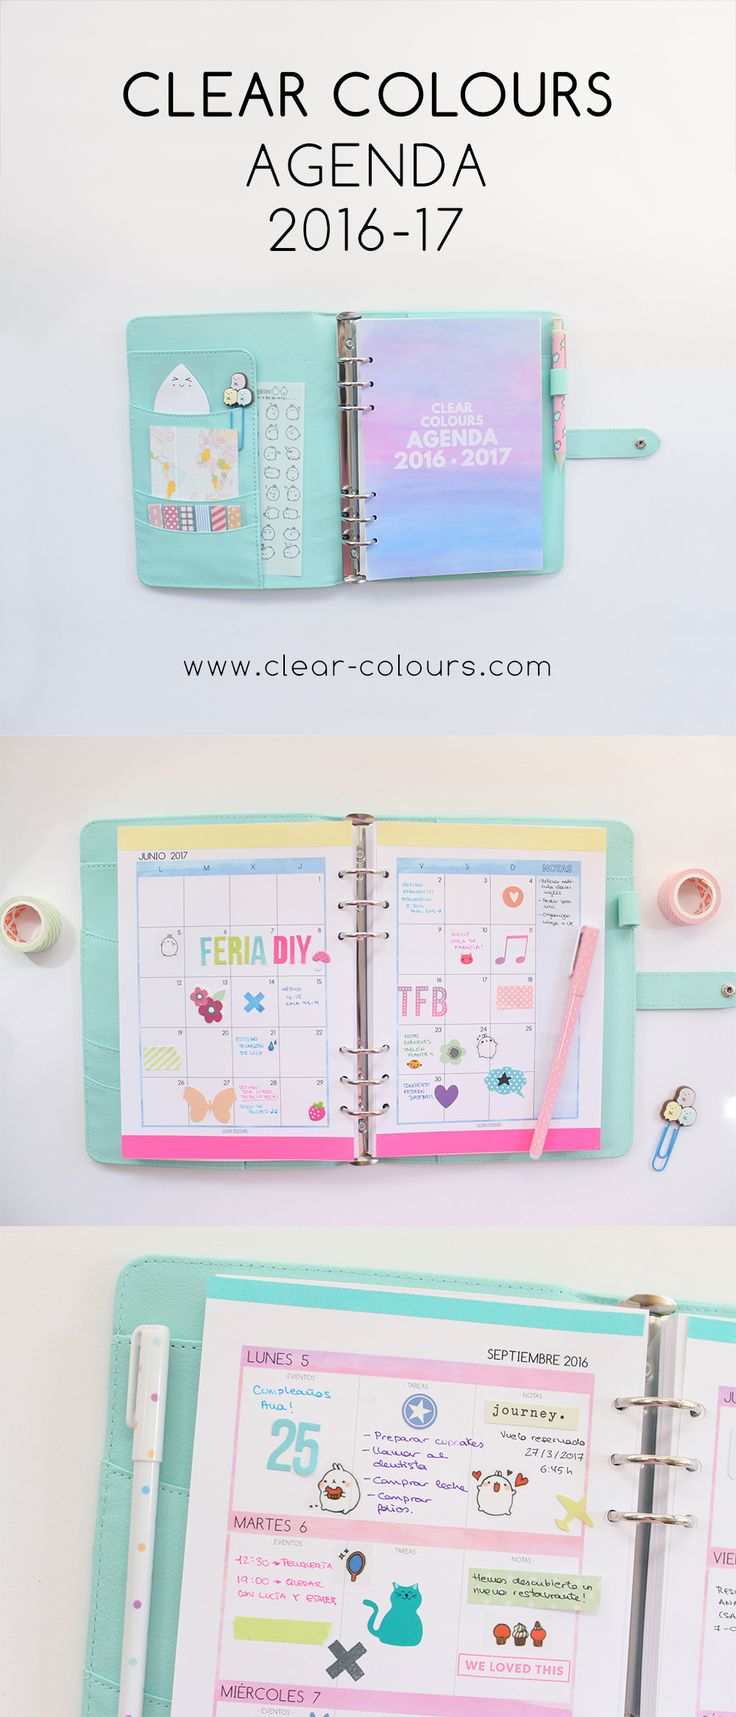 Clear Colours - Agenda 2016-17 (16 meses)